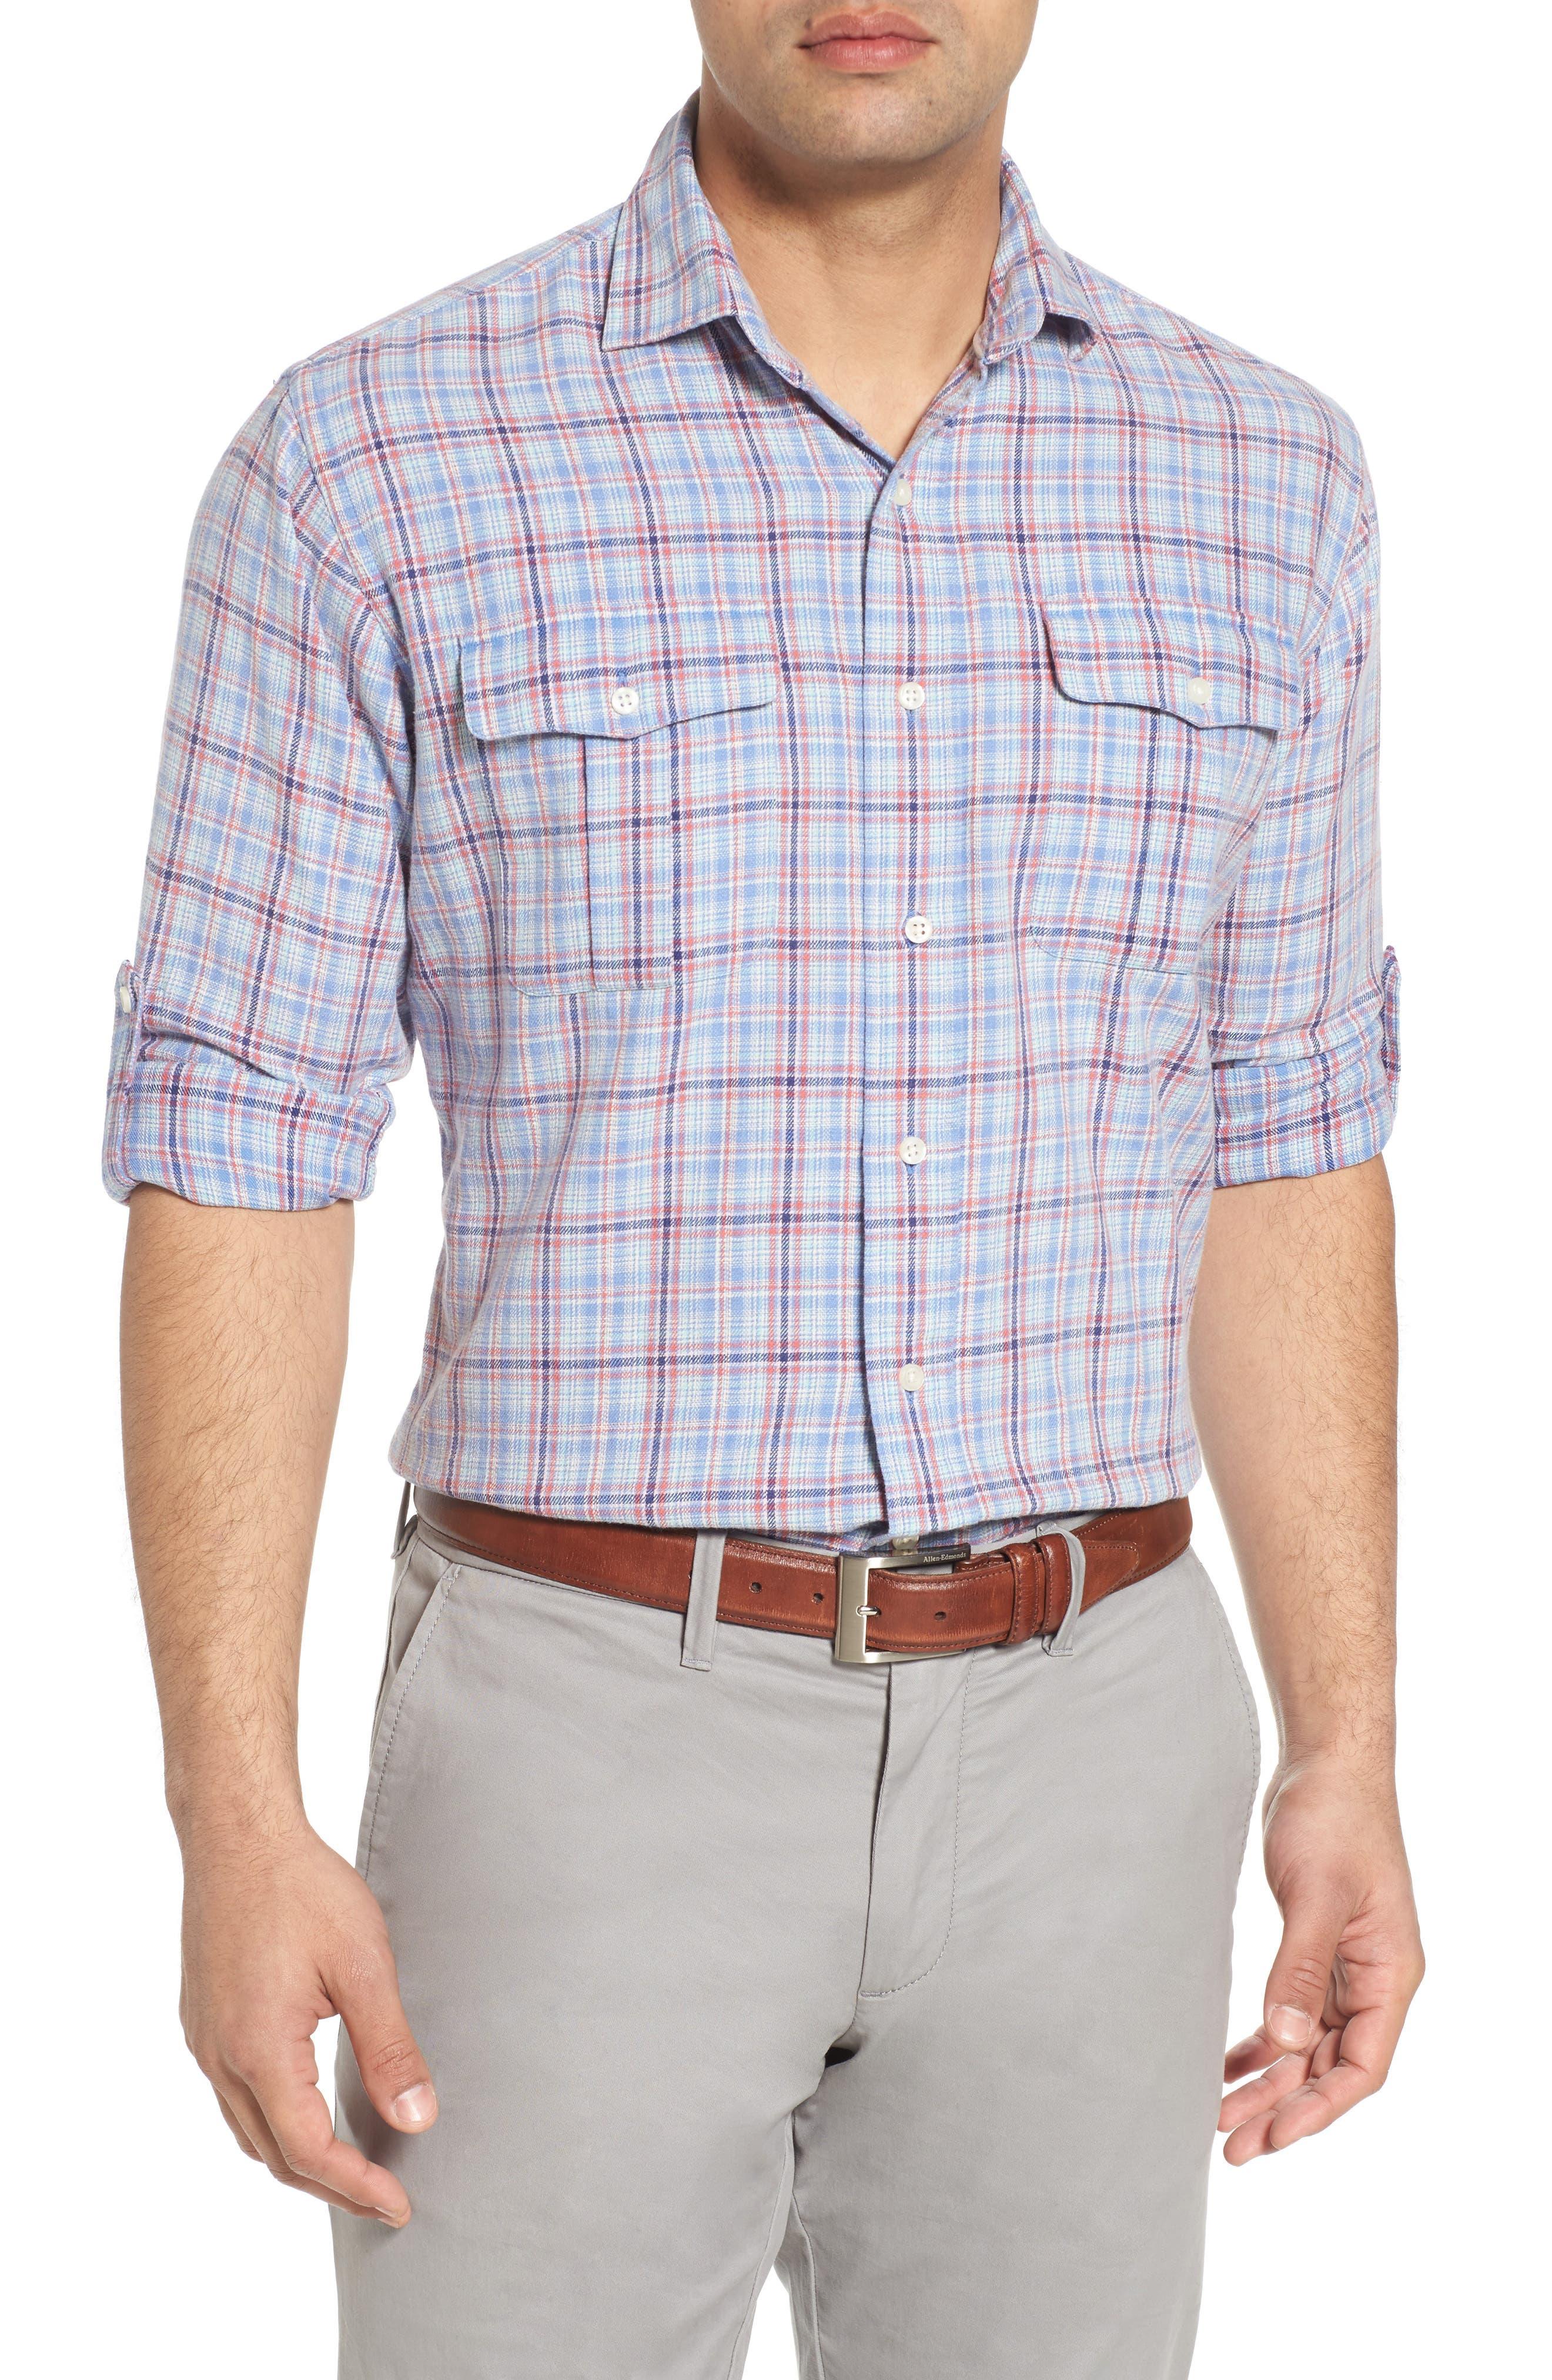 Emerald Isle Regular Fit Plaid Sport Shirt,                         Main,                         color,